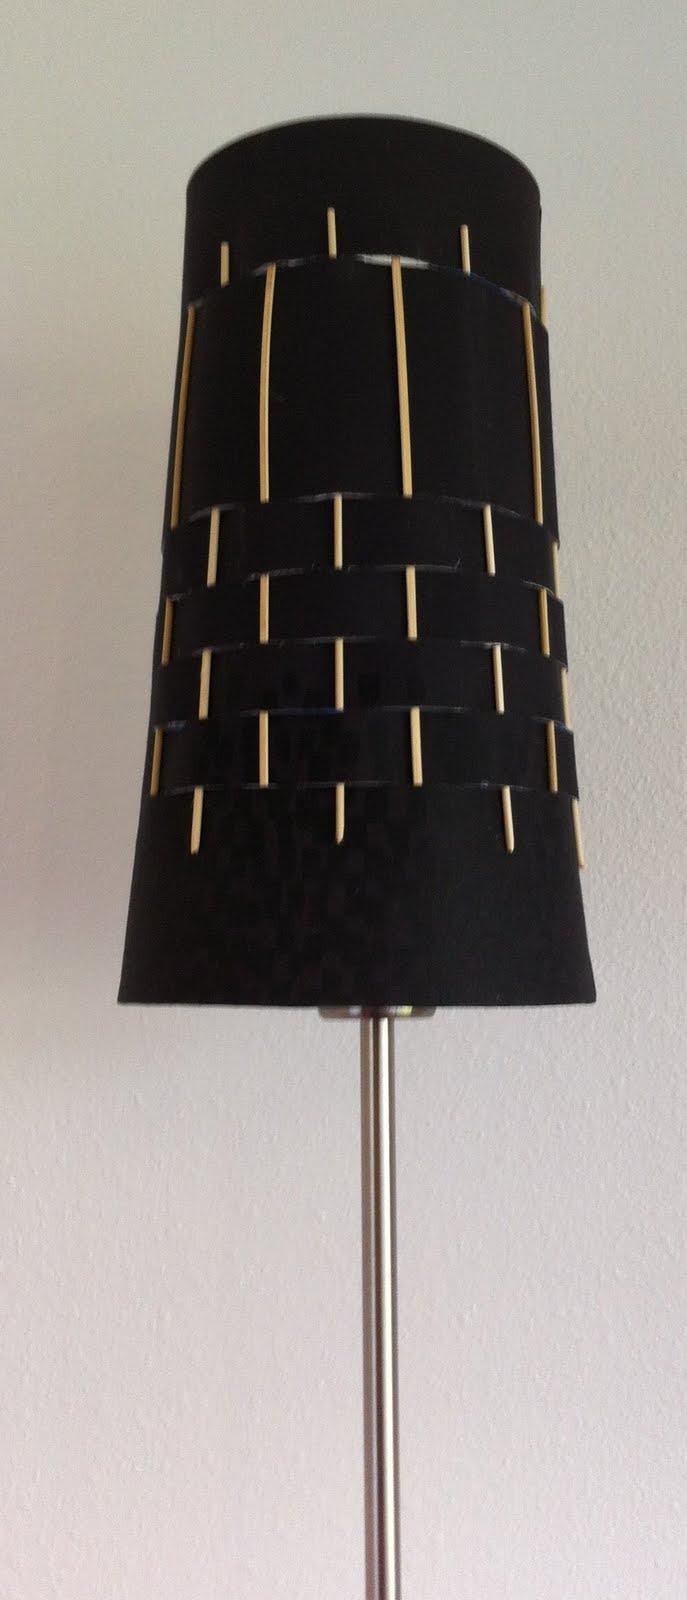 skewered ikea lamp shade